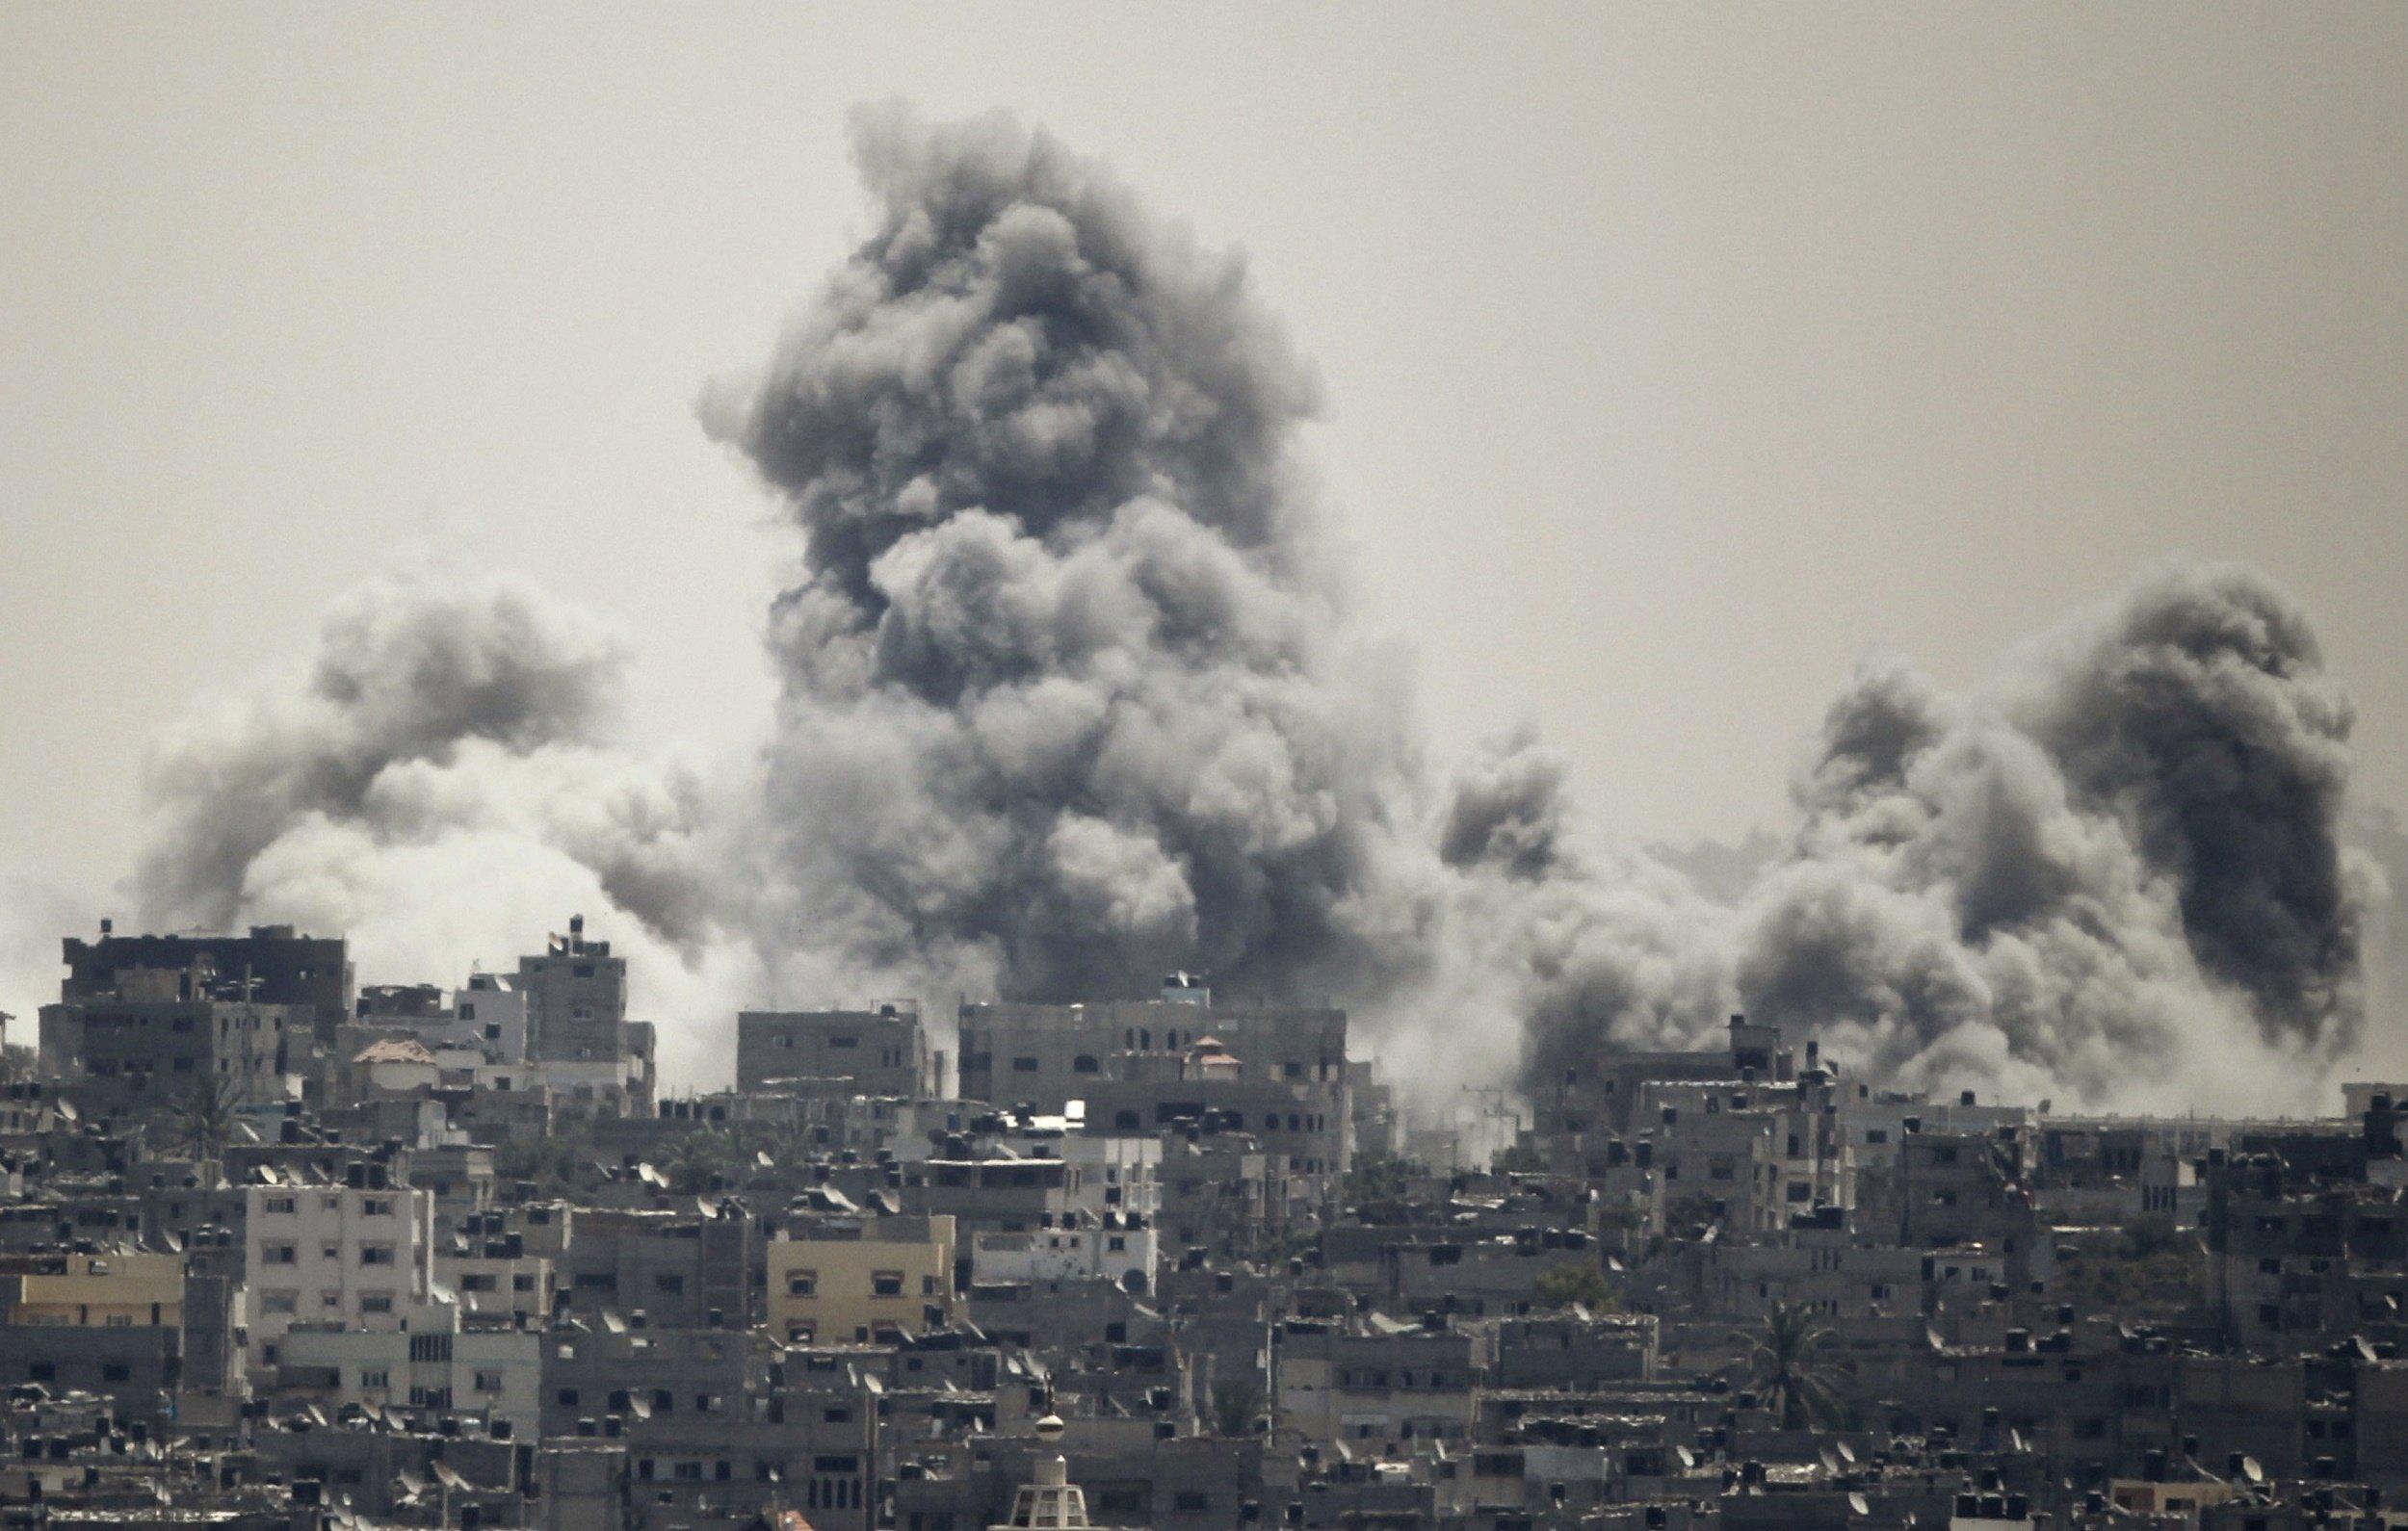 2014-07-27T114624Z_1_LYNXMPEA6Q05K_RTROPTP_4_MIDEAST-GAZA